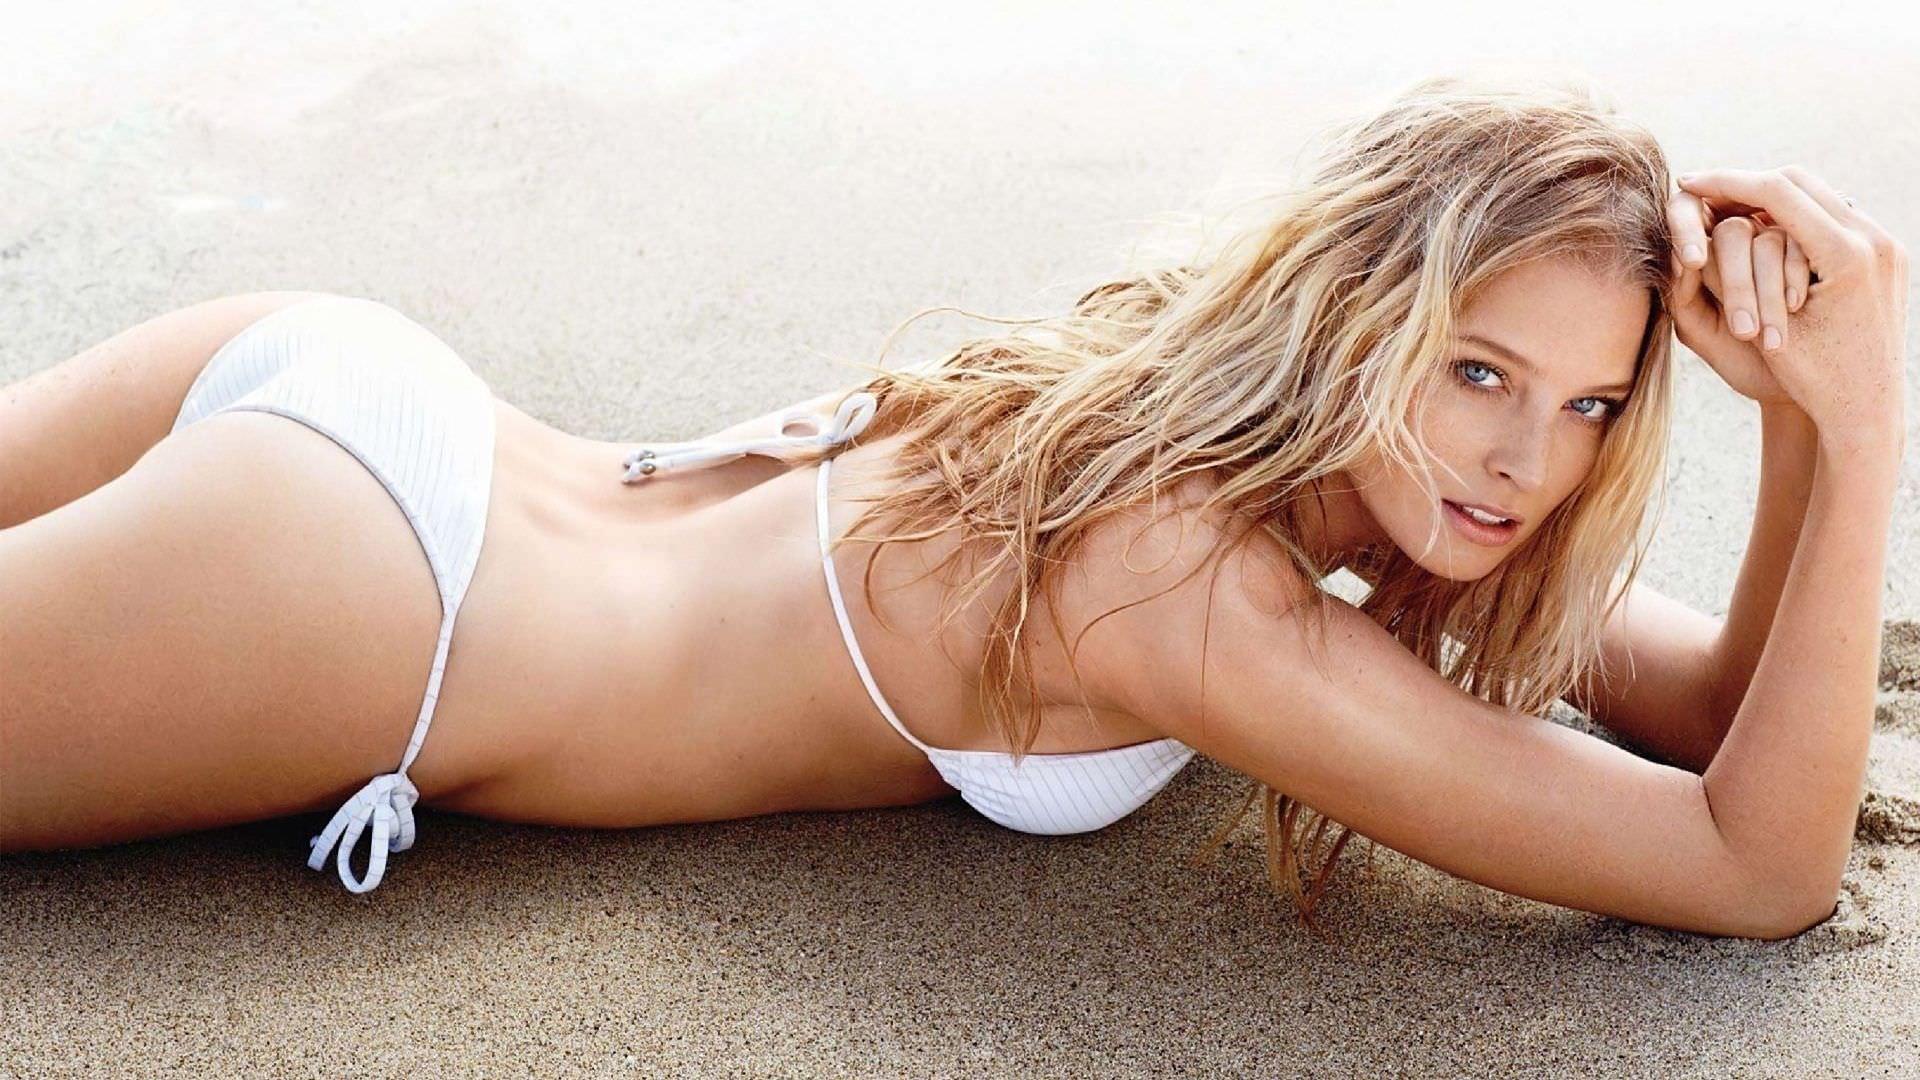 Рэйчел Николс фото на песке